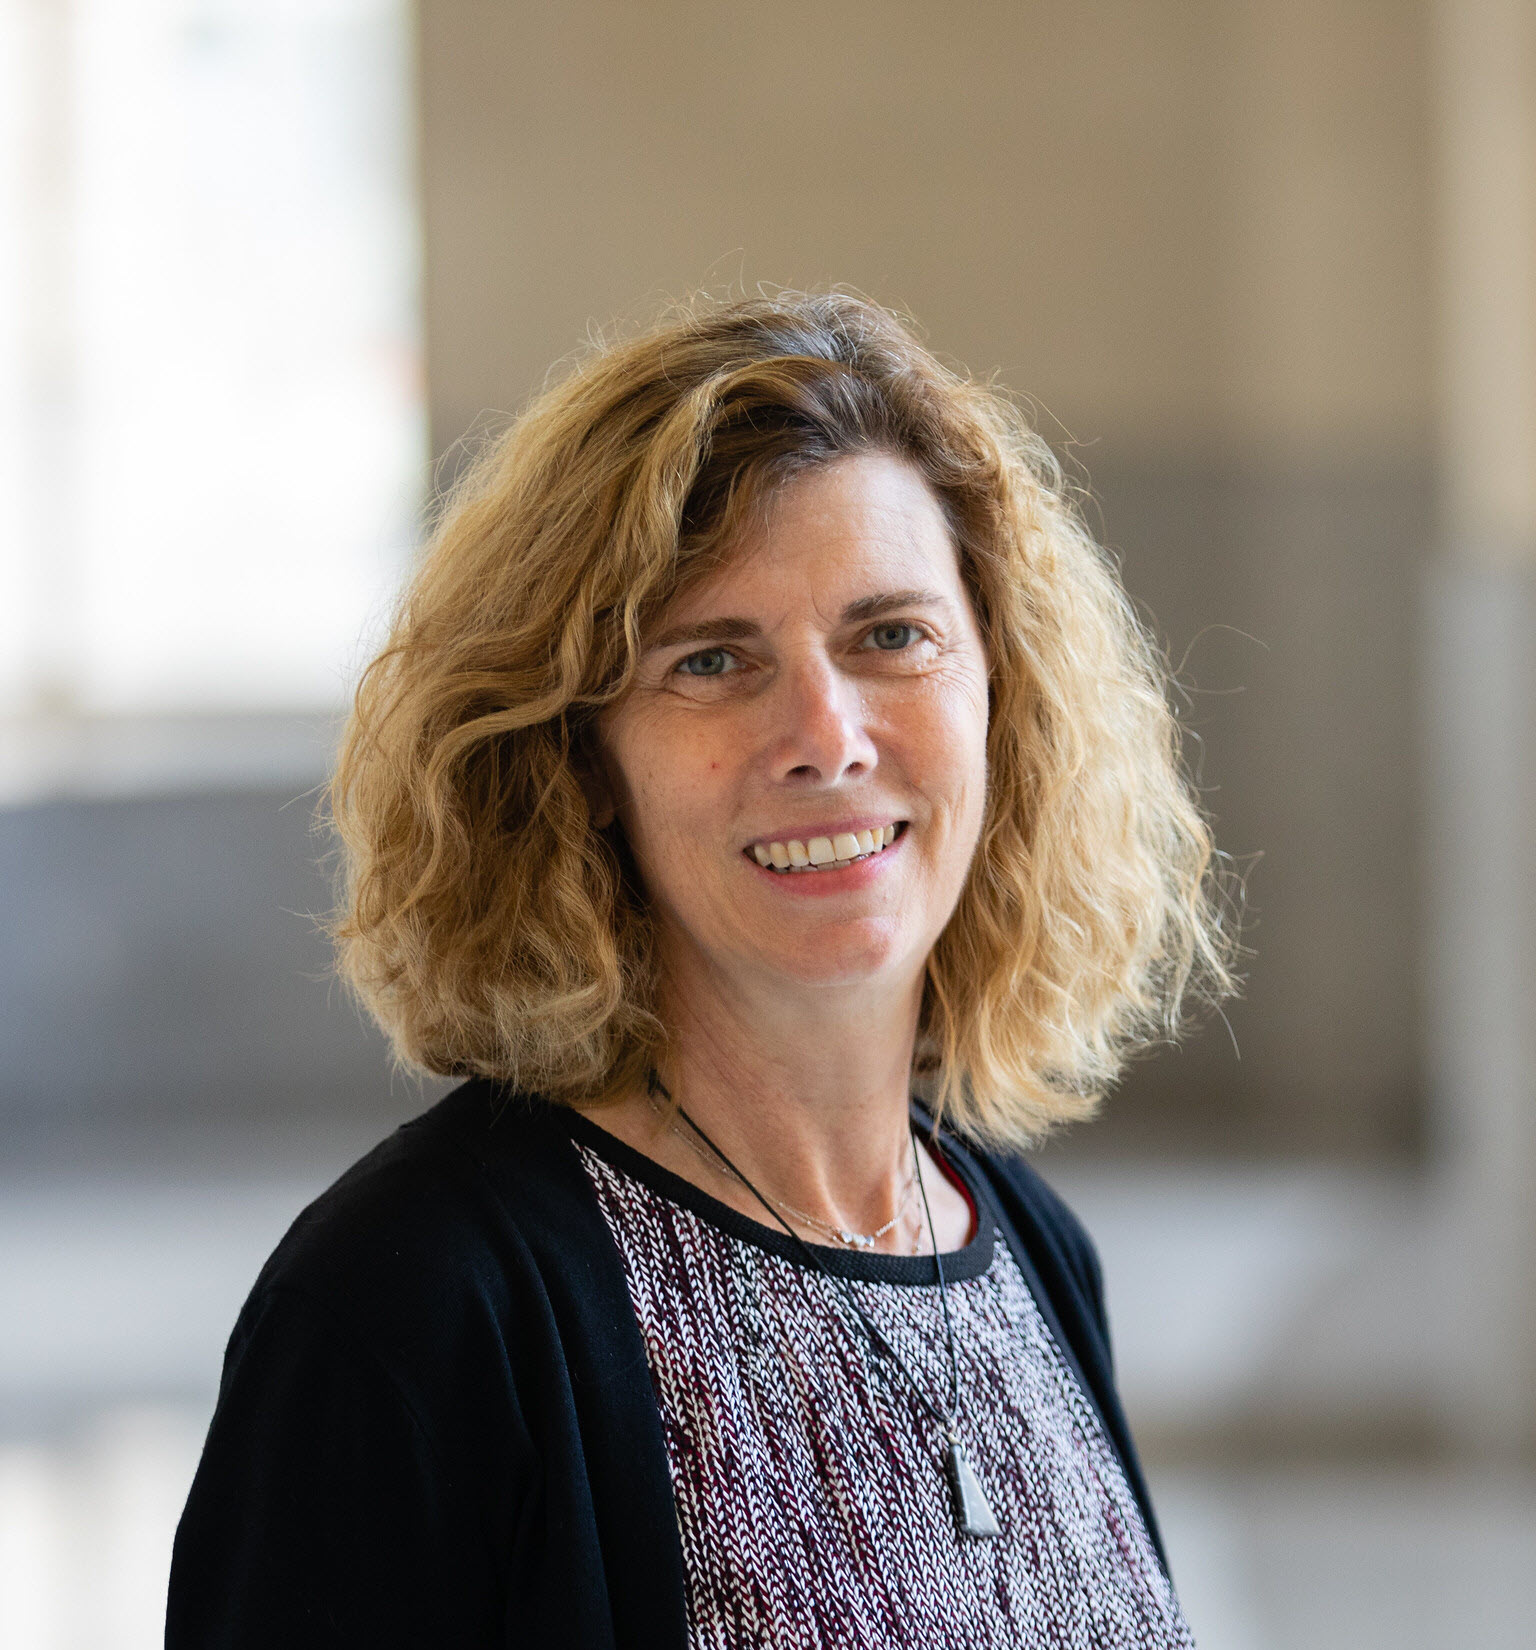 Dr. Allison M. Macfarlane - feature